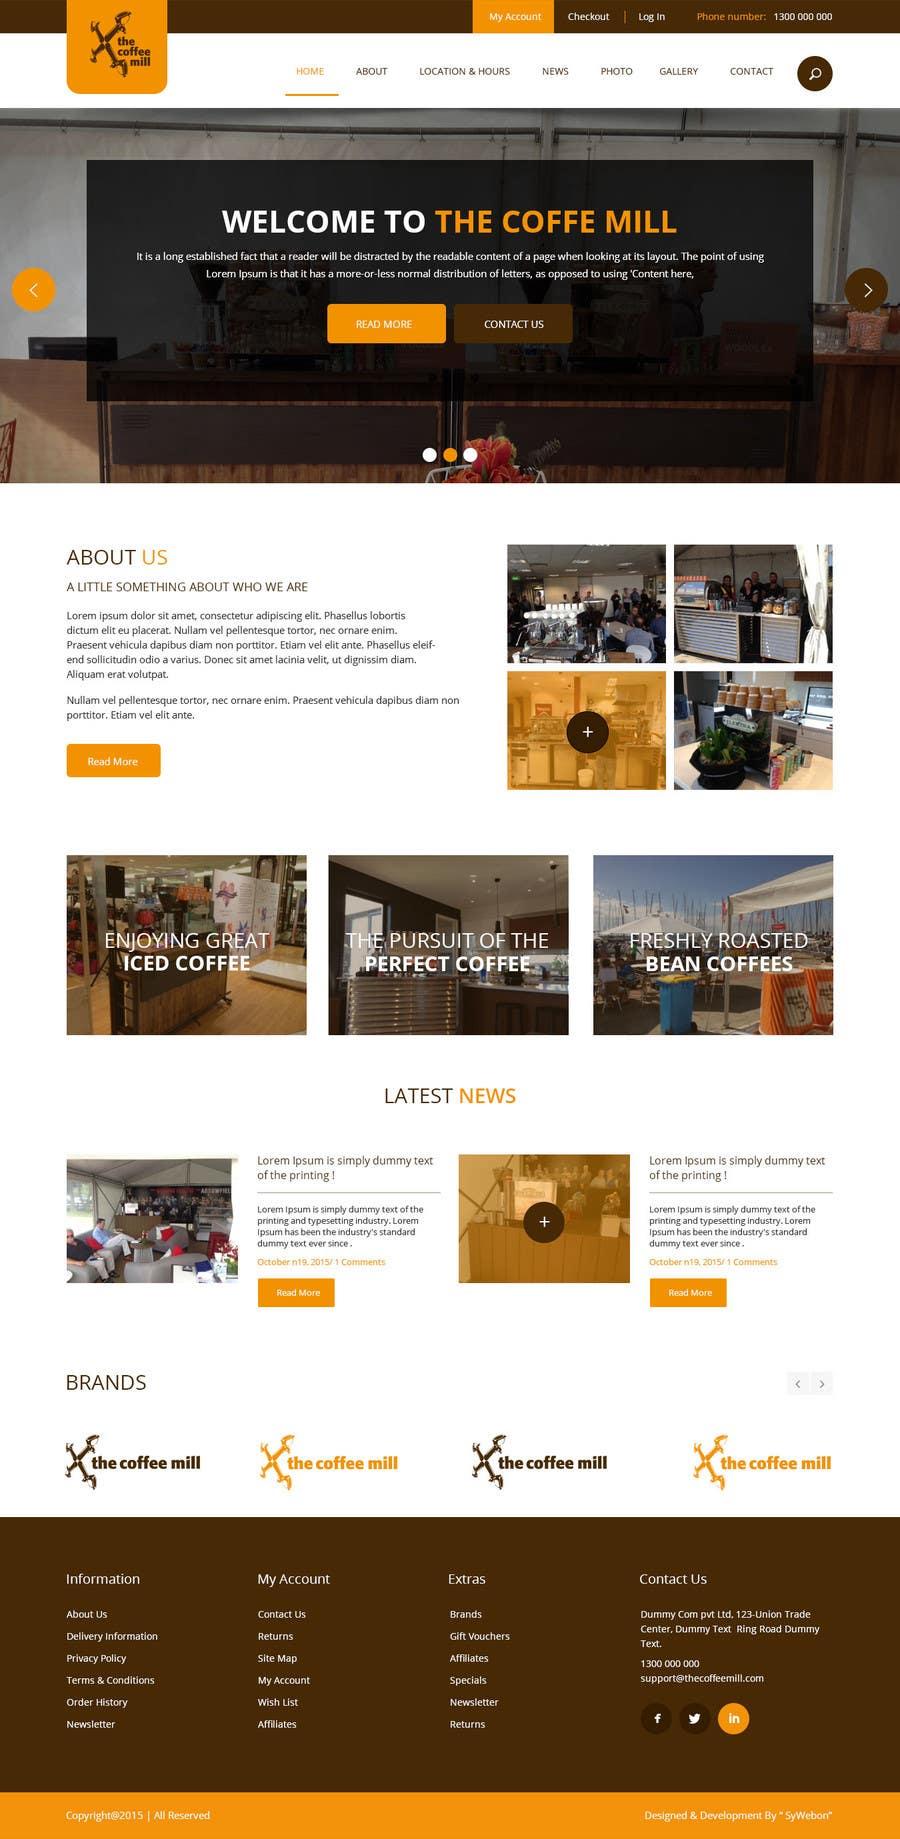 Konkurrenceindlæg #                                        19                                      for                                         Design a Website Mockup for a Mobile Coffee Business